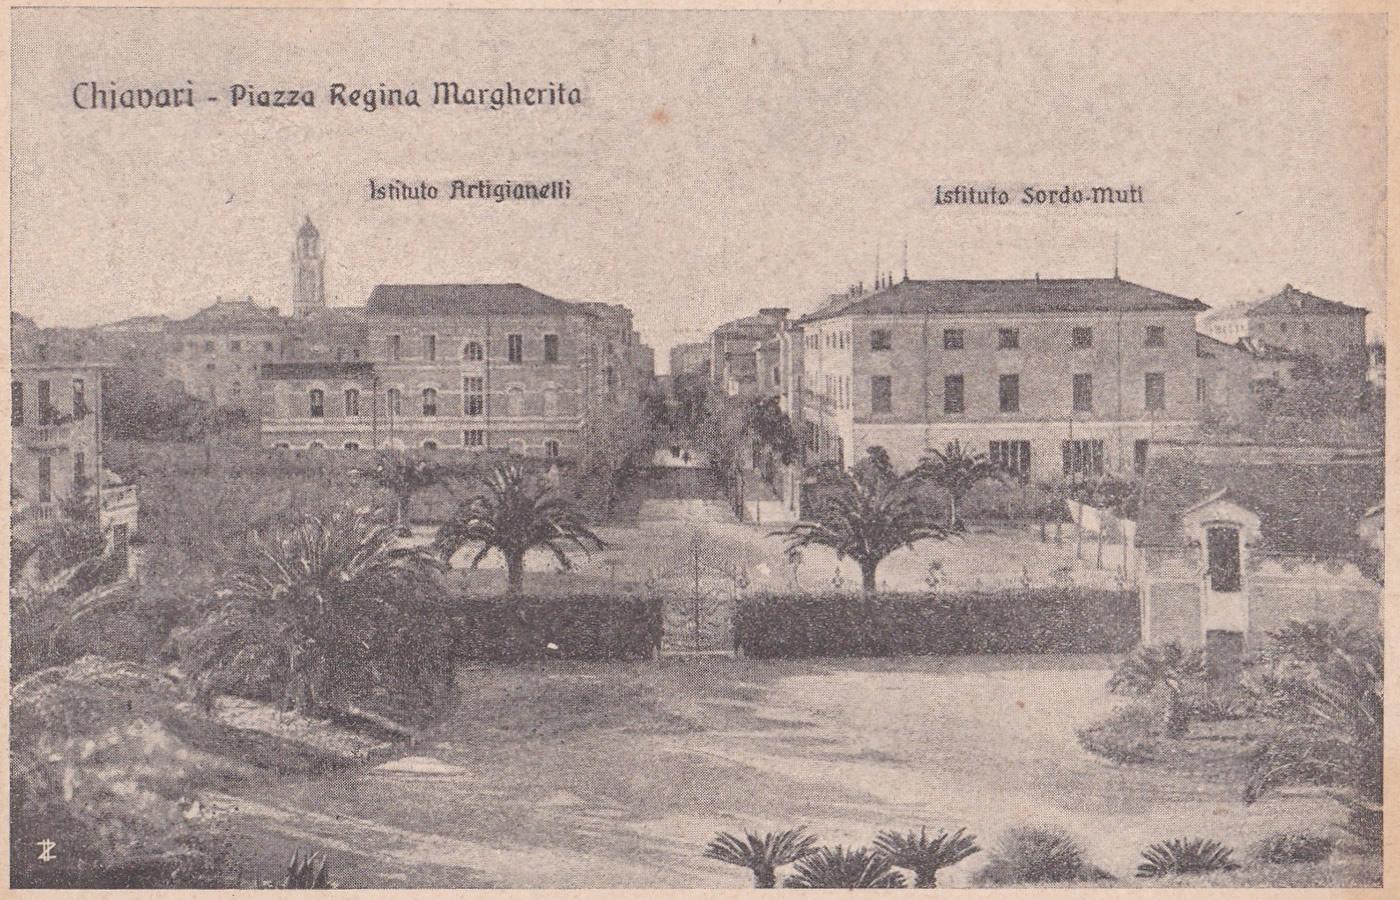 Chiavari - piazza Regina Margherita